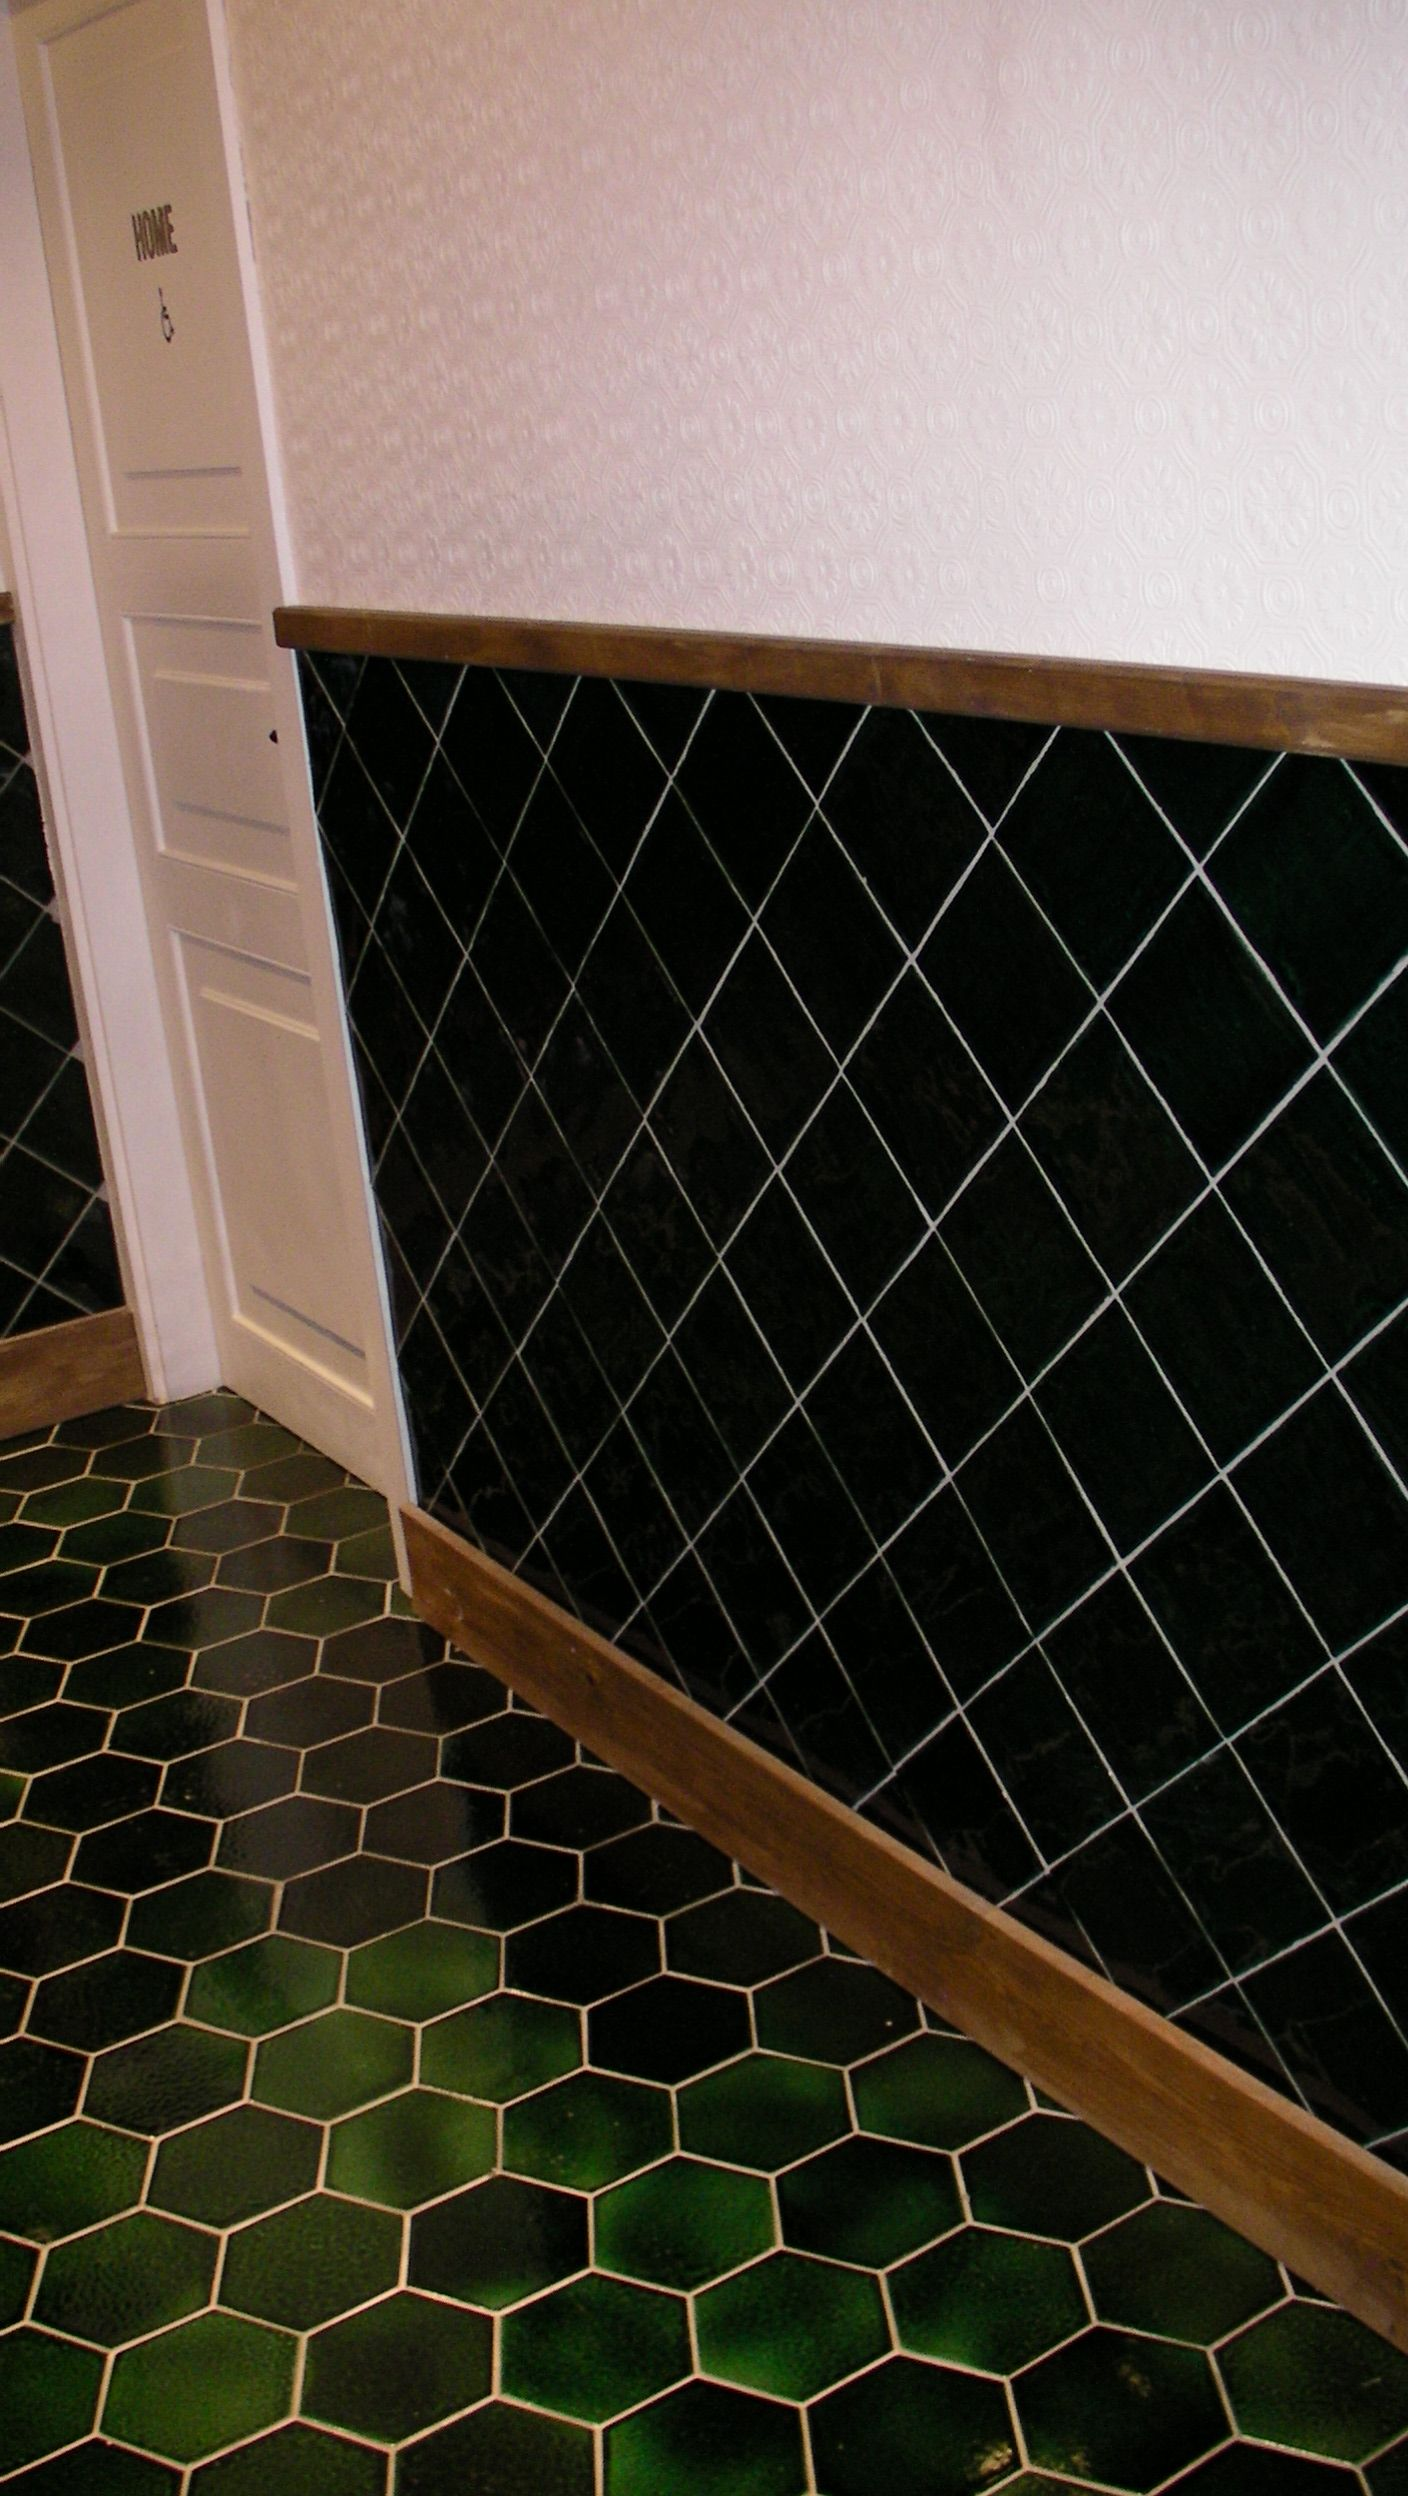 Azulejos hexagonales verdes green hexagonal tiles art antic proyectos artesanos azulejos - Baldosas hexagonales ...